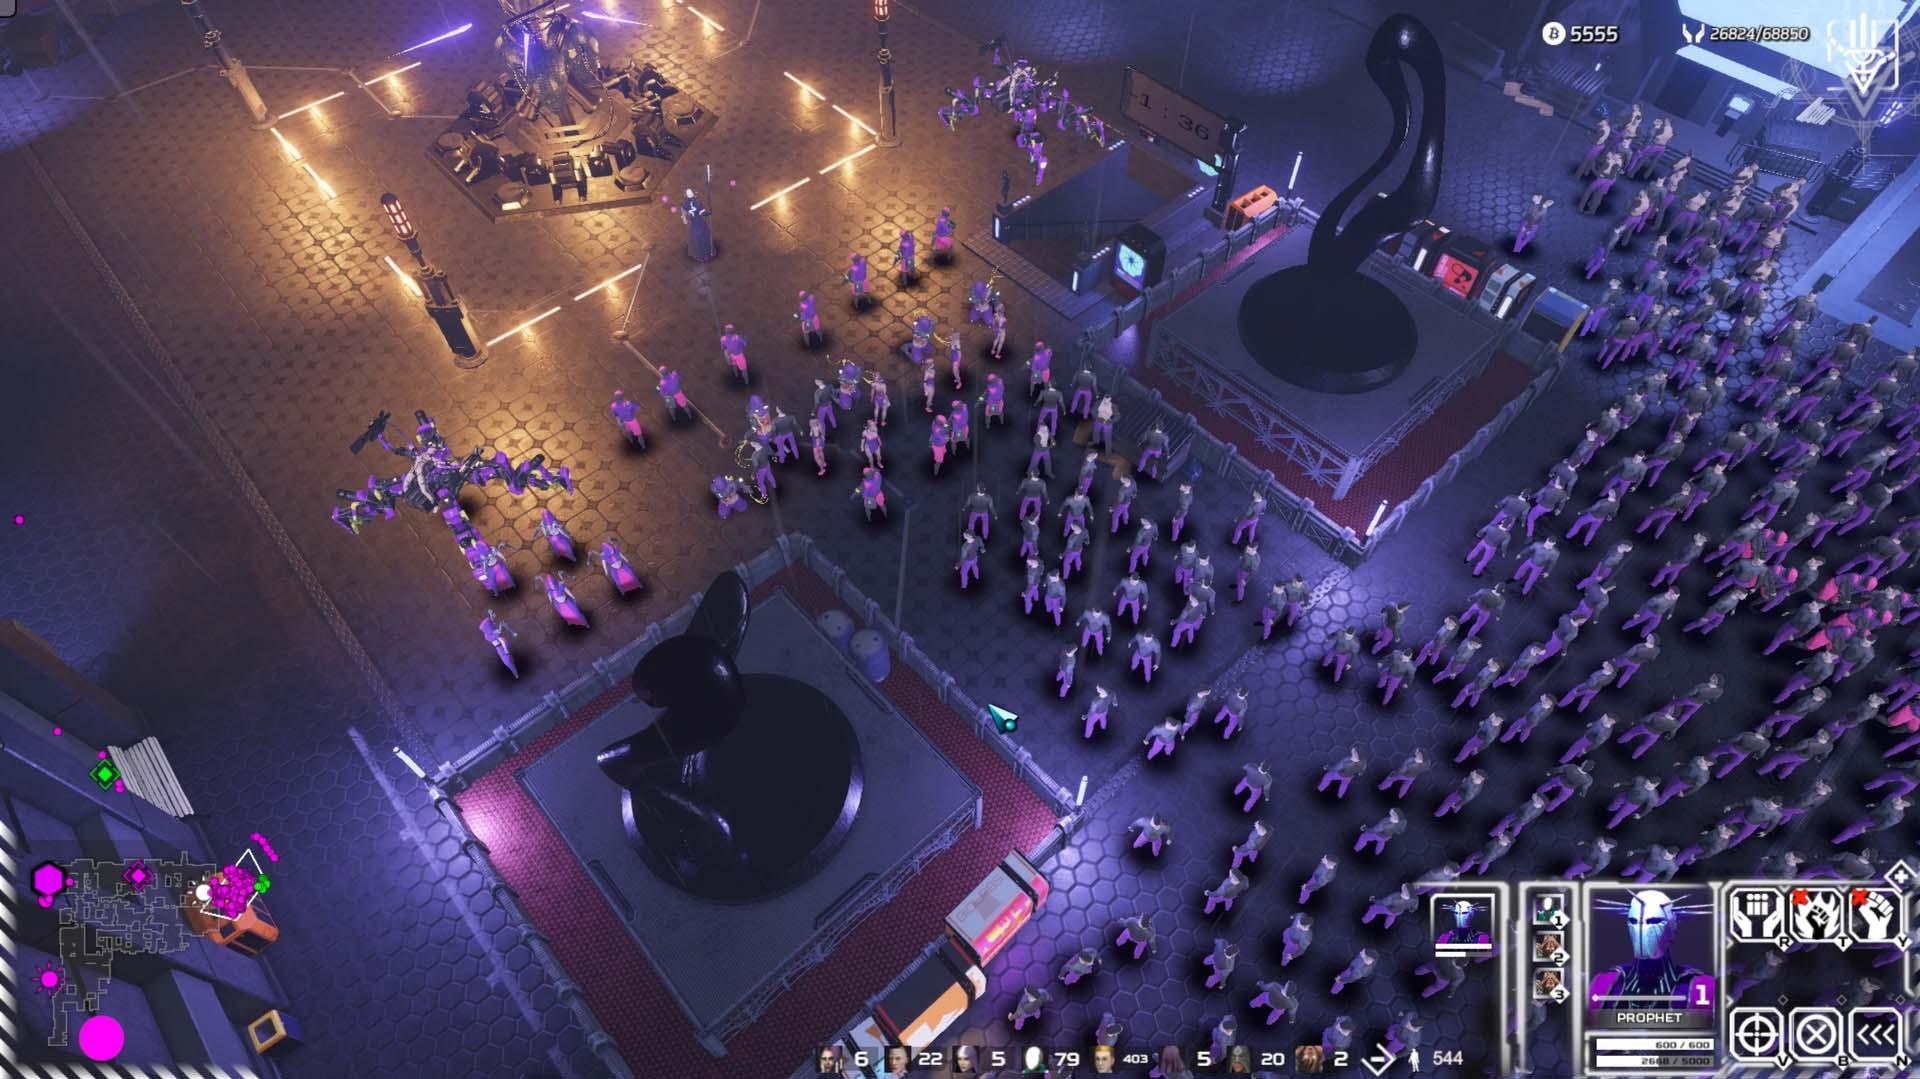 Re-Legion - dystopische Cyberpunk-Welt